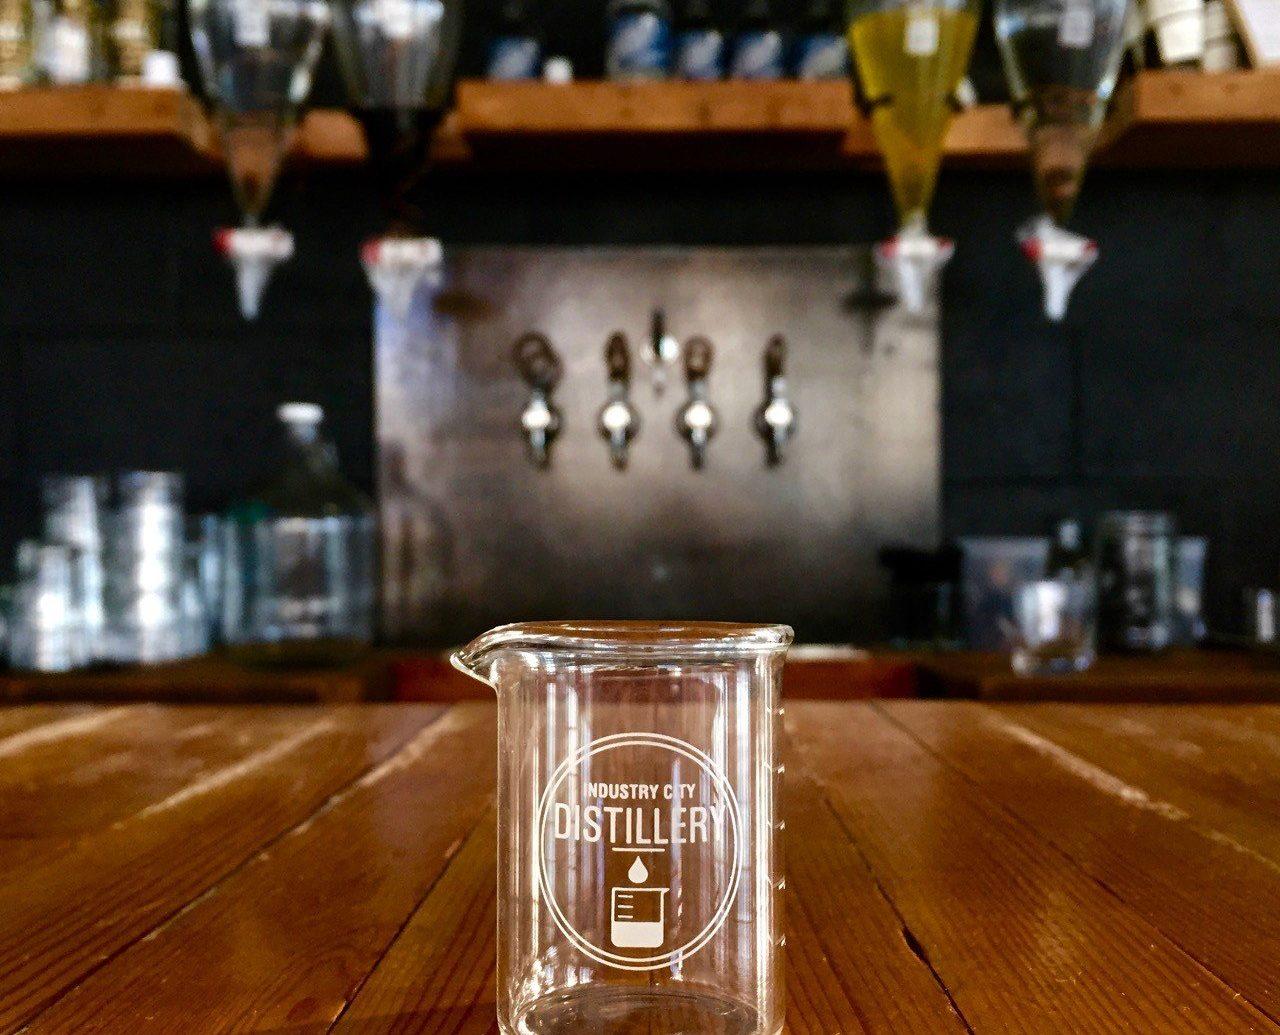 Brooklyn Food + Drink Drink alcoholic beverage distilled beverage glass barware alcohol glass bottle pint us table beer Bar liqueur